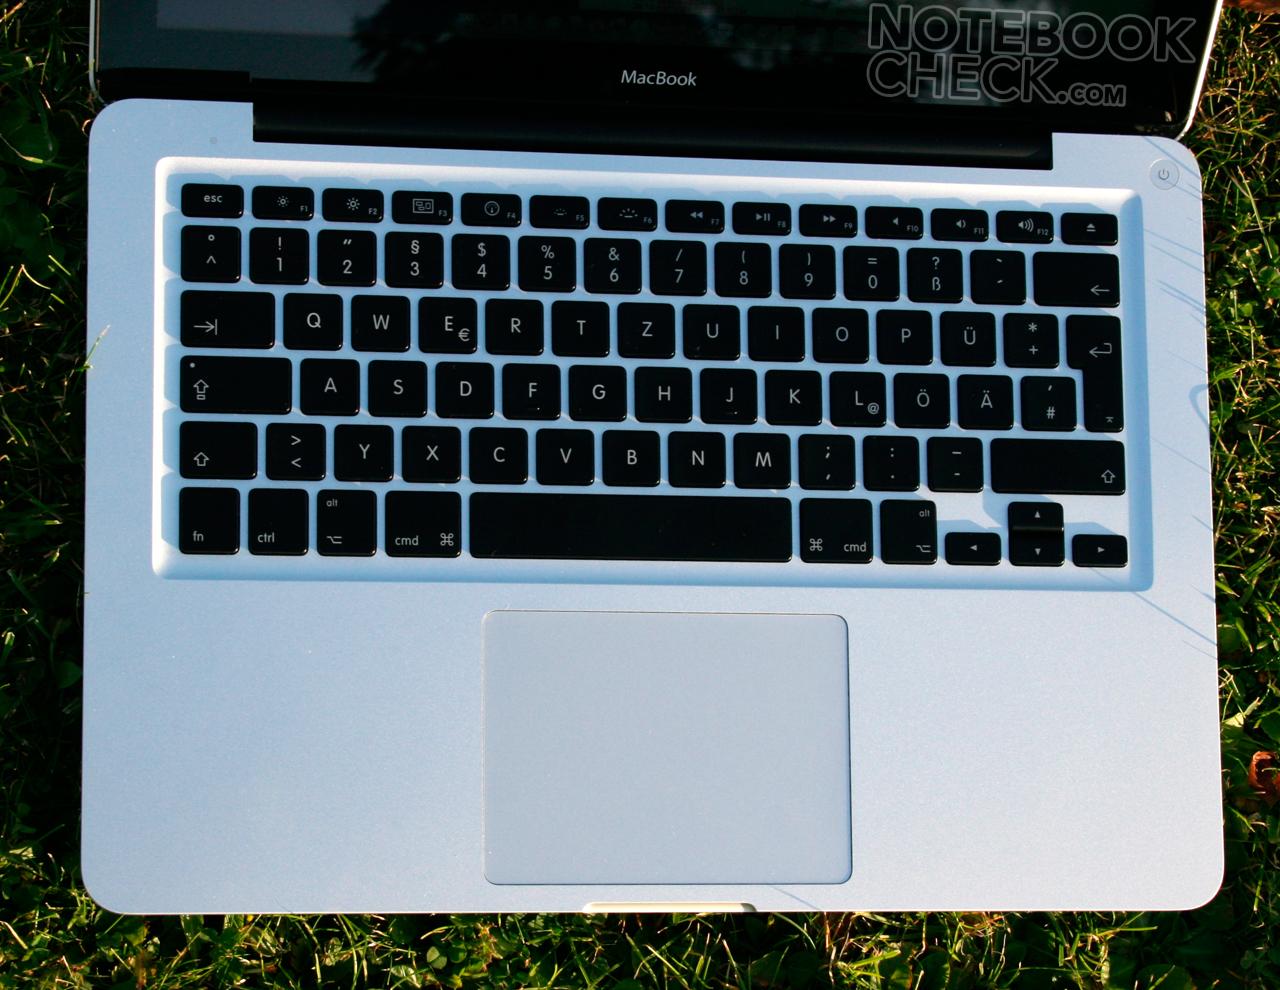 "Review Apple MacBook Aluminum 2.0 GHz (Unibody, 13"", 9400M, P7350) -  NotebookCheck.net Reviews"